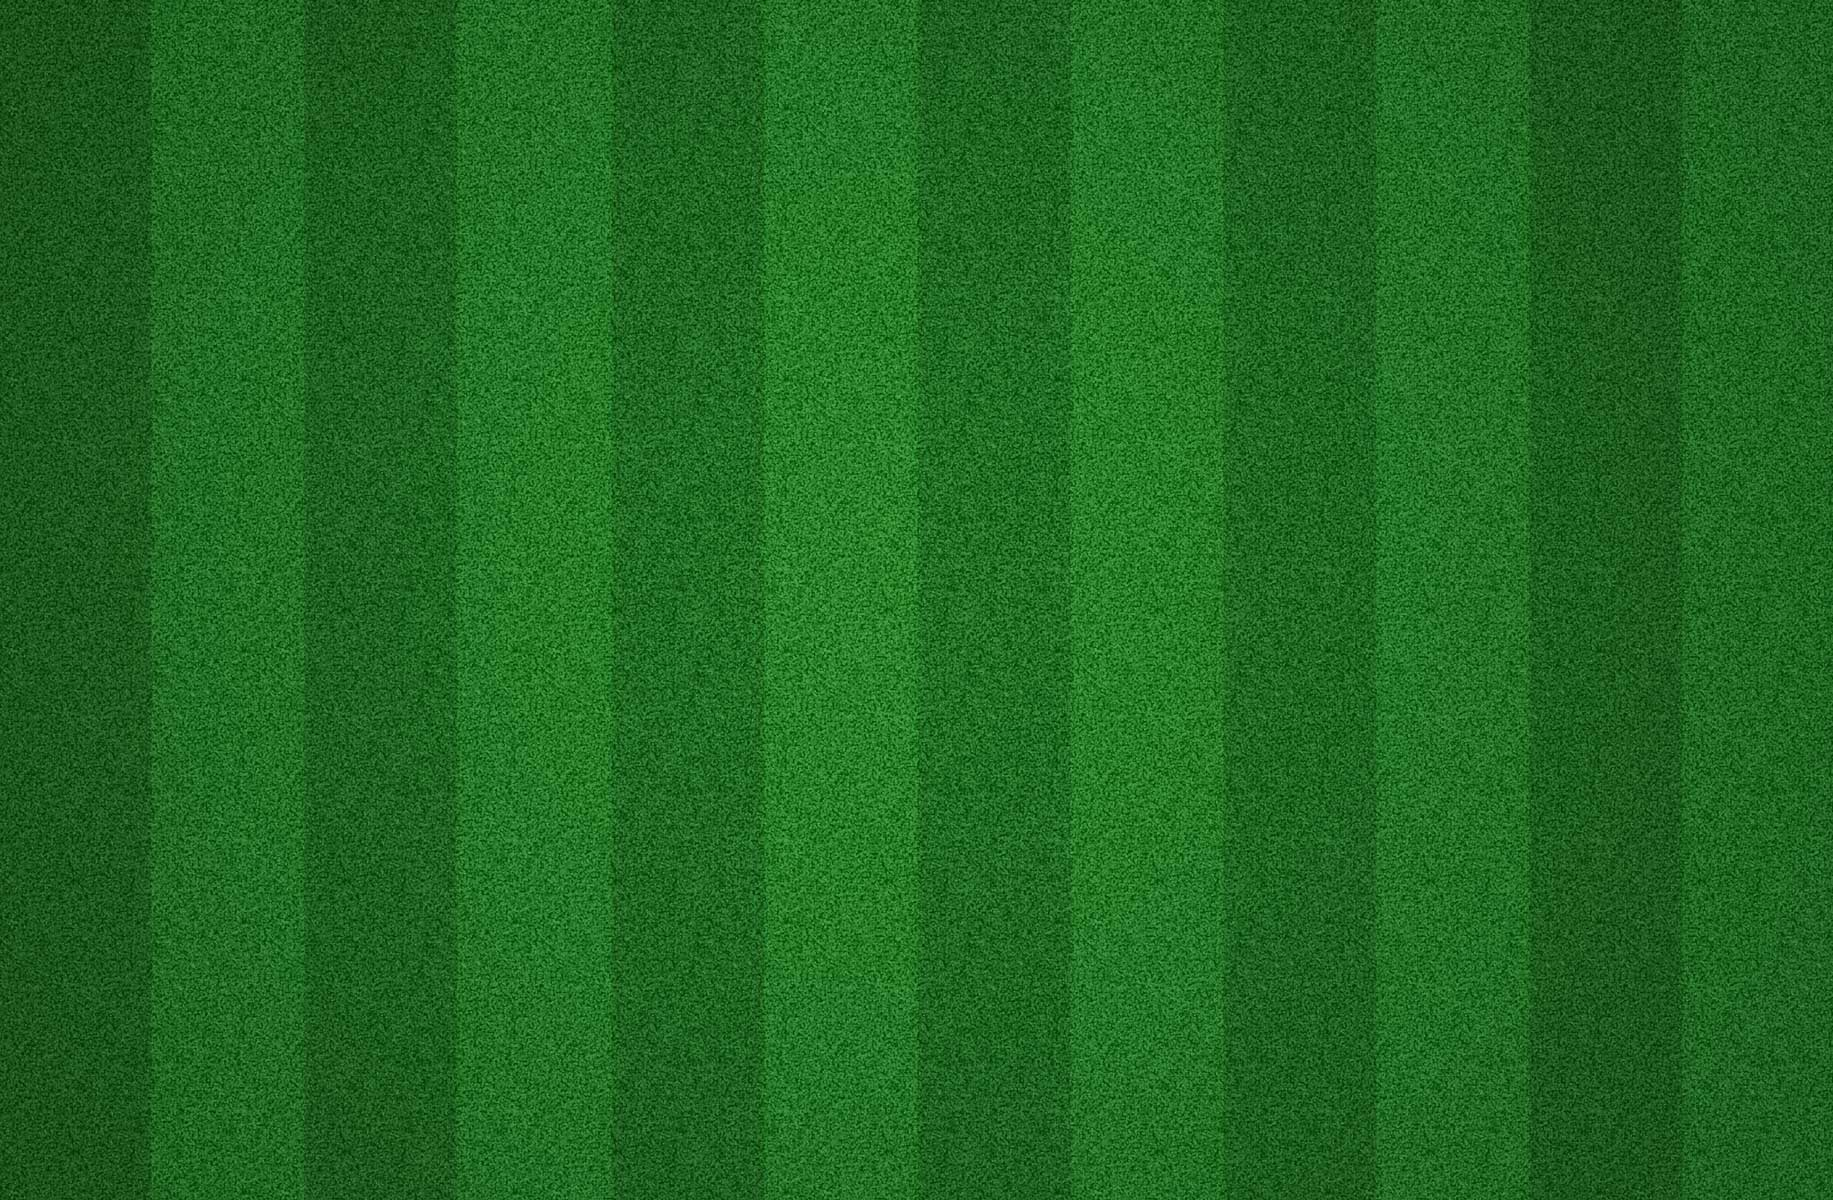 field-stripes